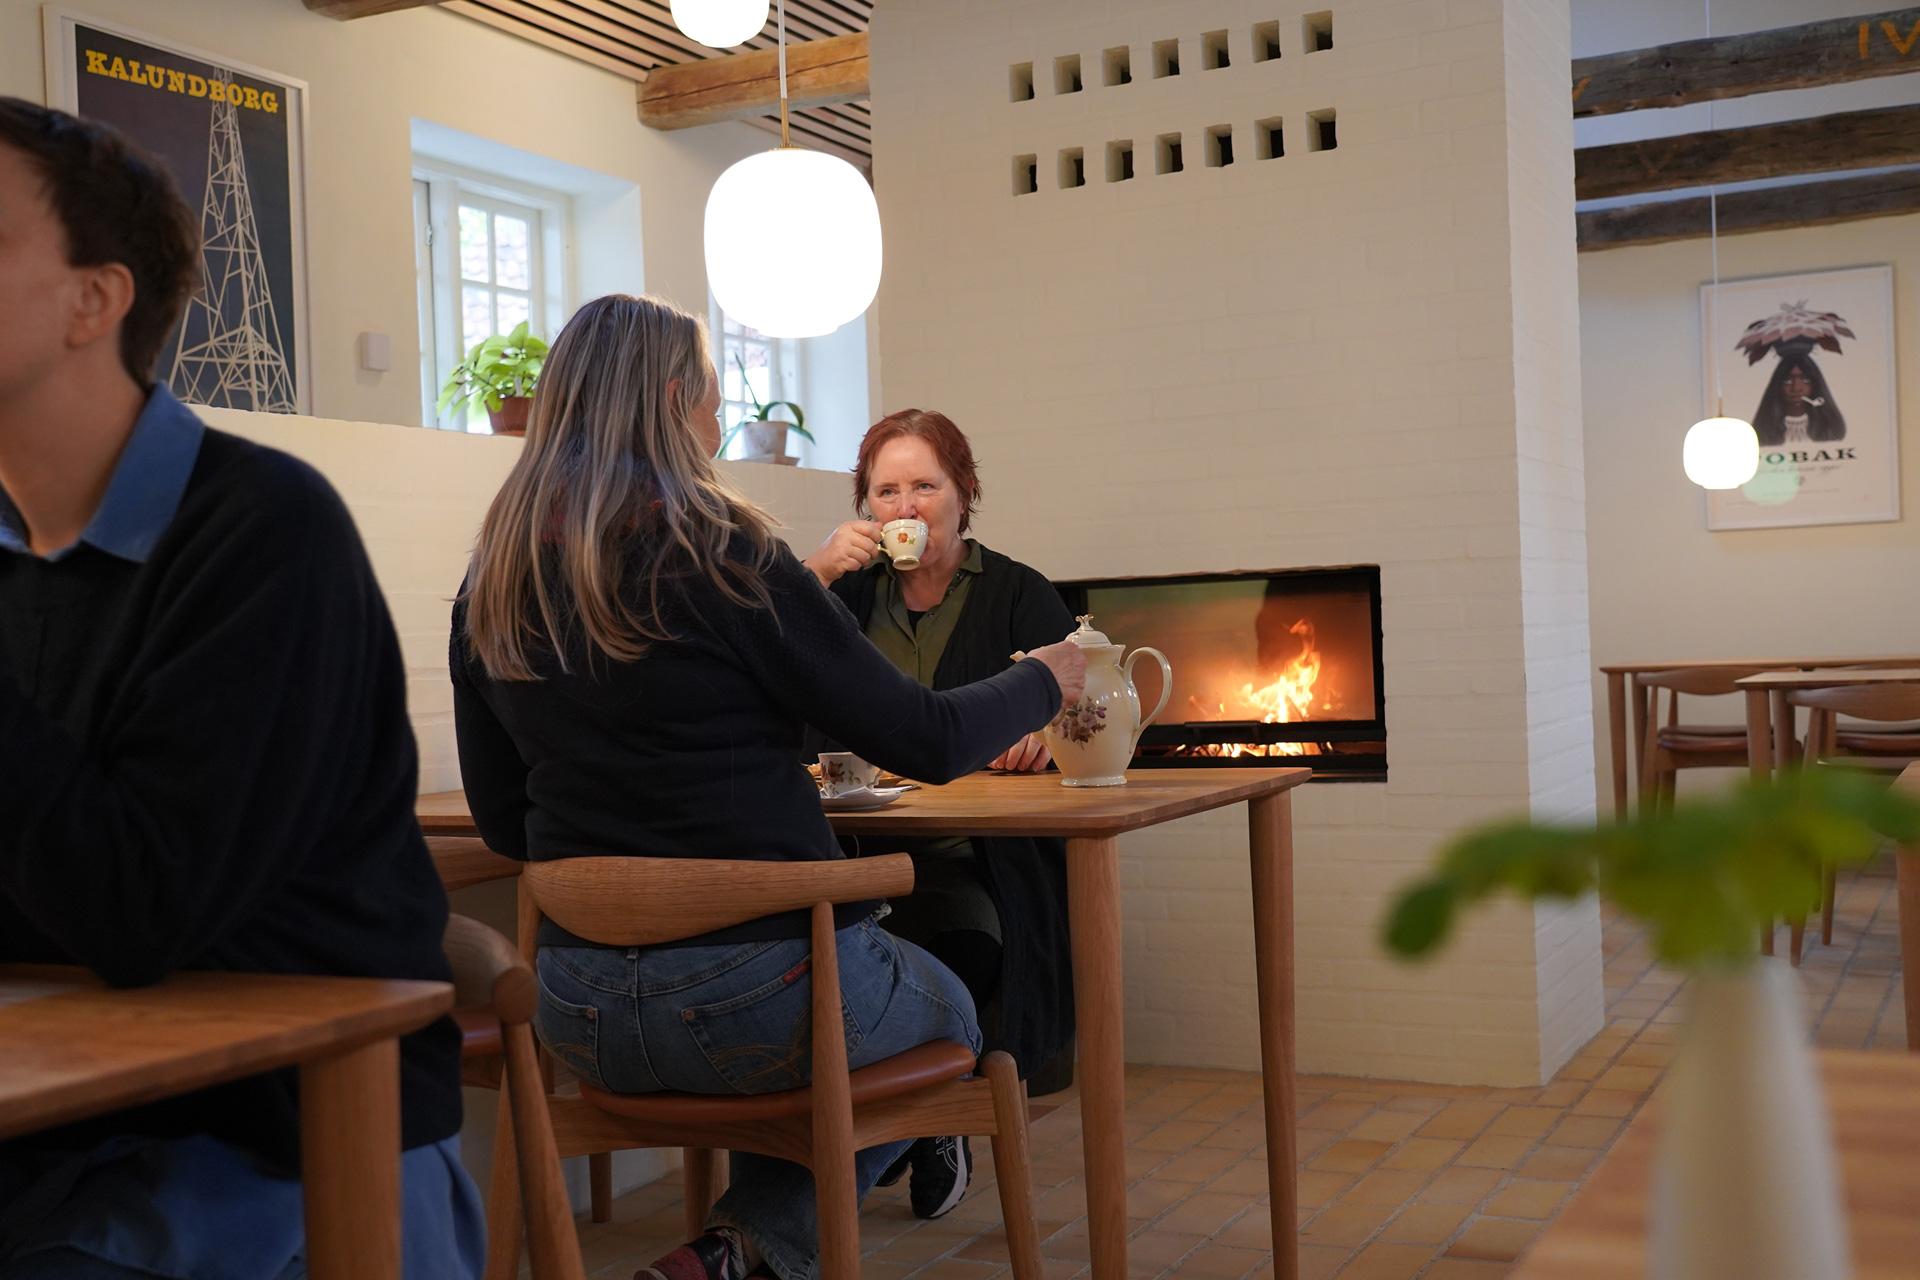 Mad med historie: Den Gamle By åbner ny restaurant